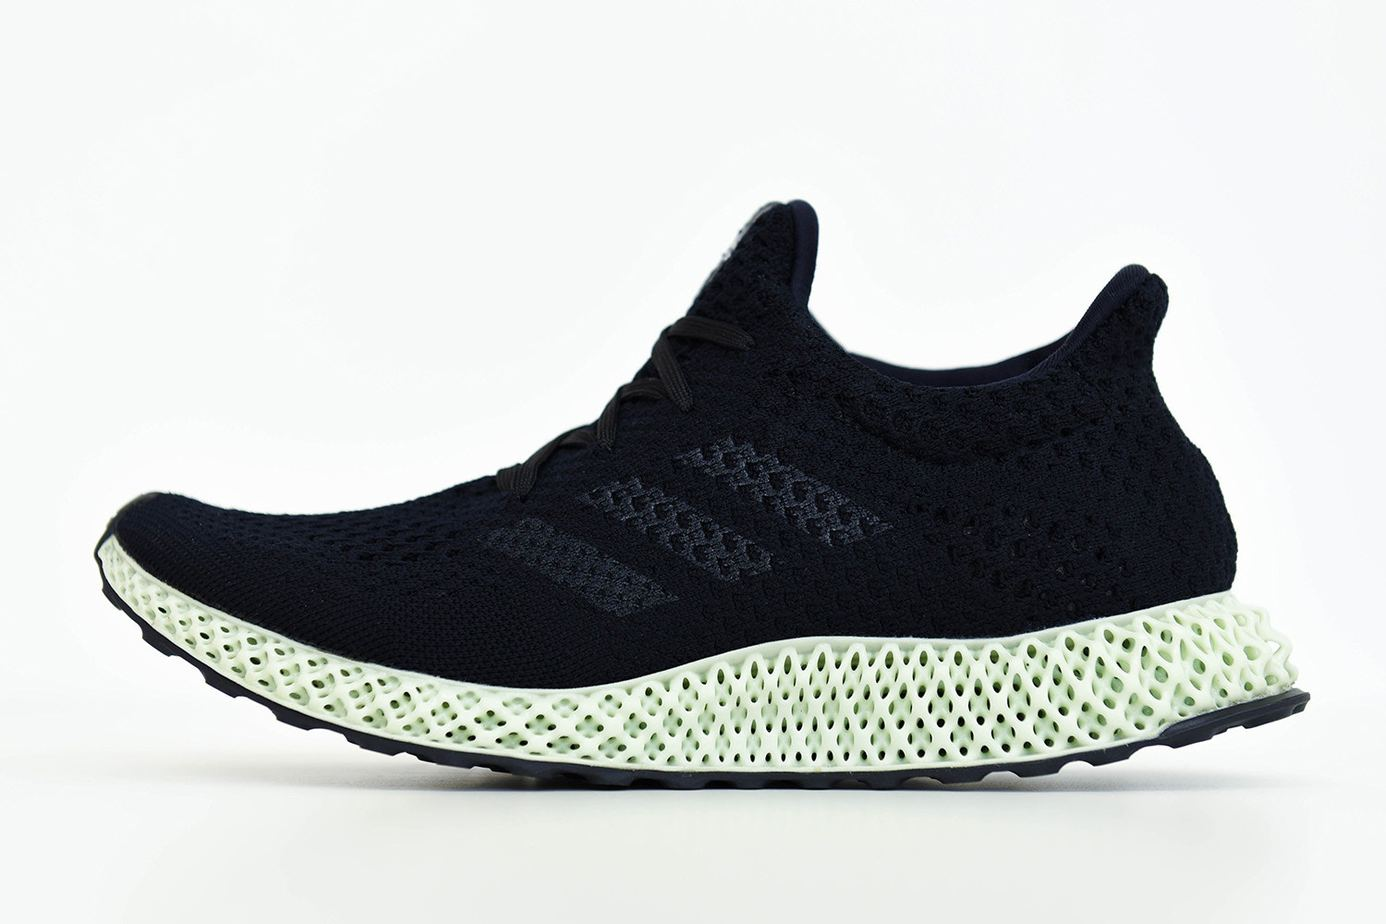 Adidas Ultra Sale For Netherlands 1afaa 00646 Boost Futurecraft O8Nwmn0v